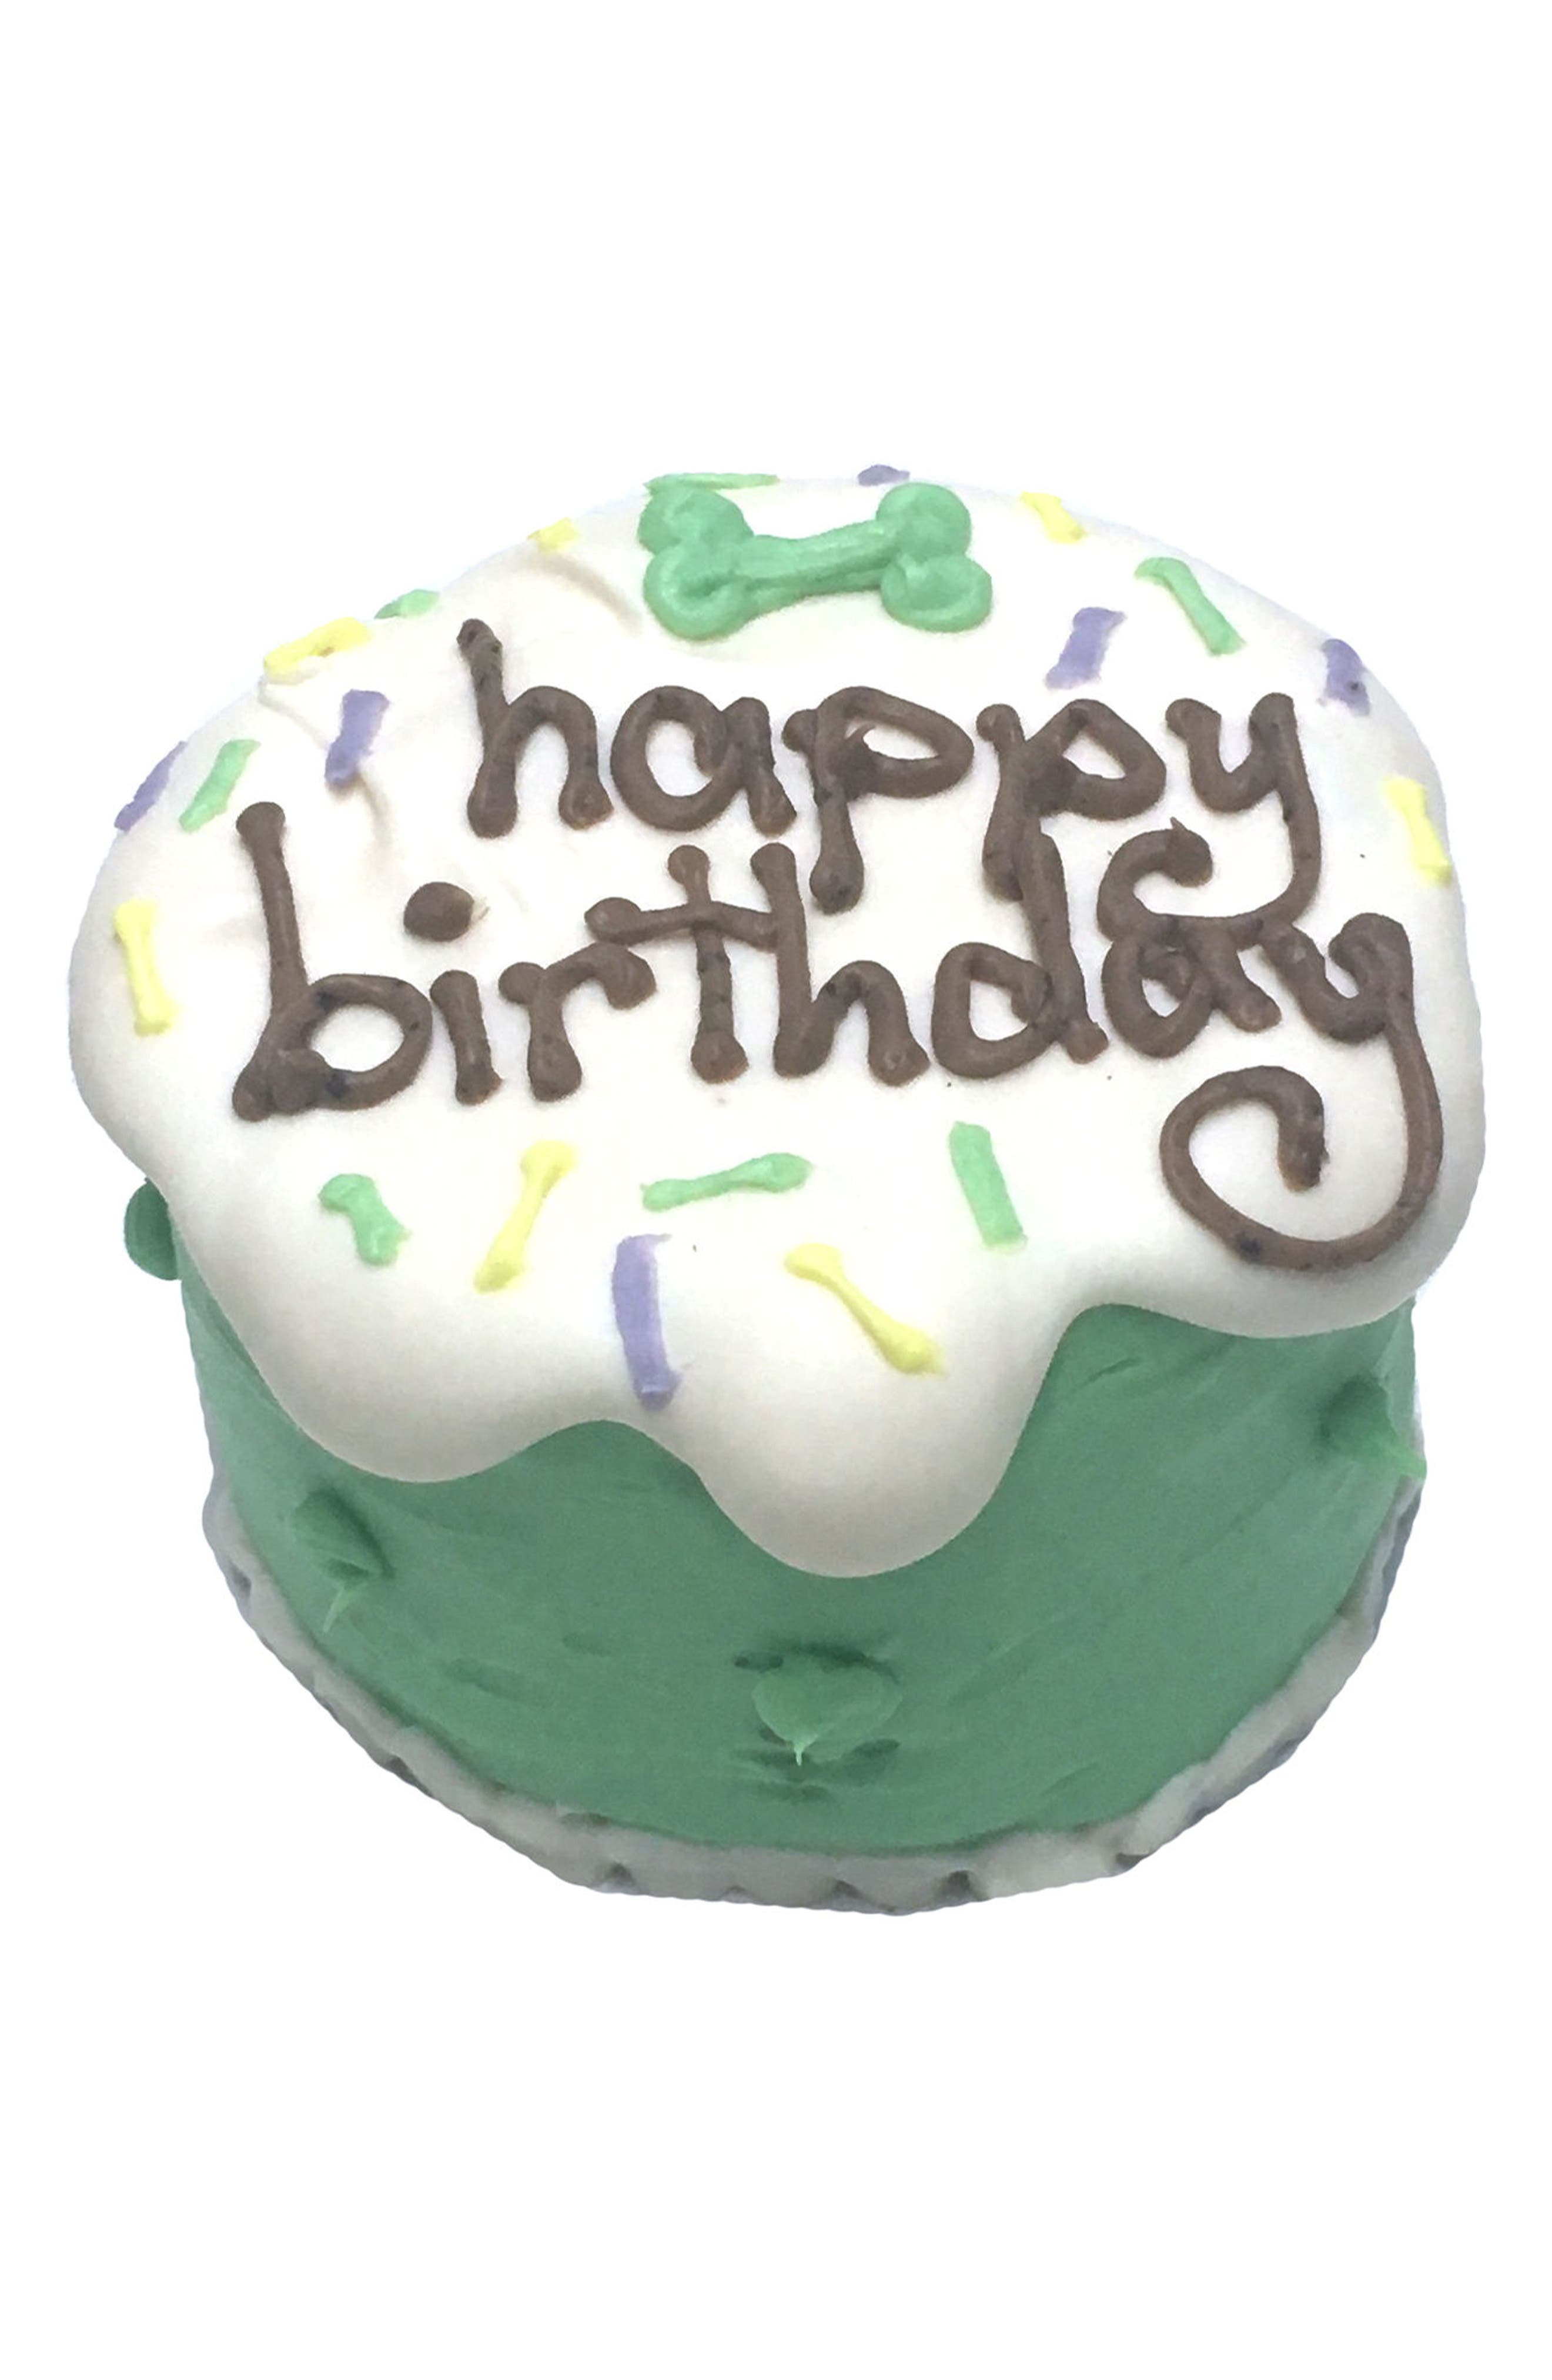 Bubba Rose Biscuit Company Unisex Birthday Baby Cake Dog Treat